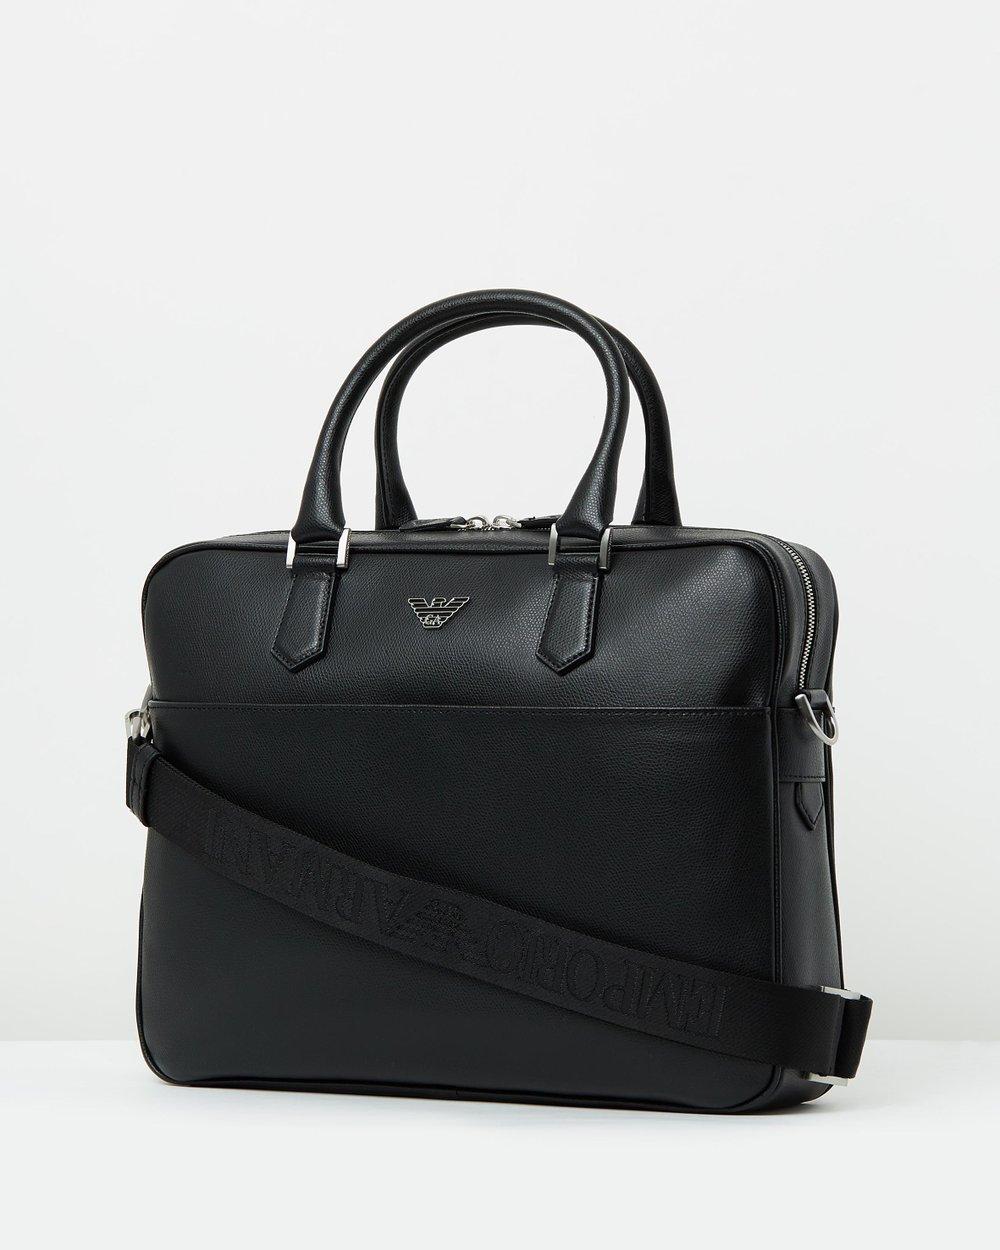 5fb871328849 Leather Briefcase by Emporio Armani Online